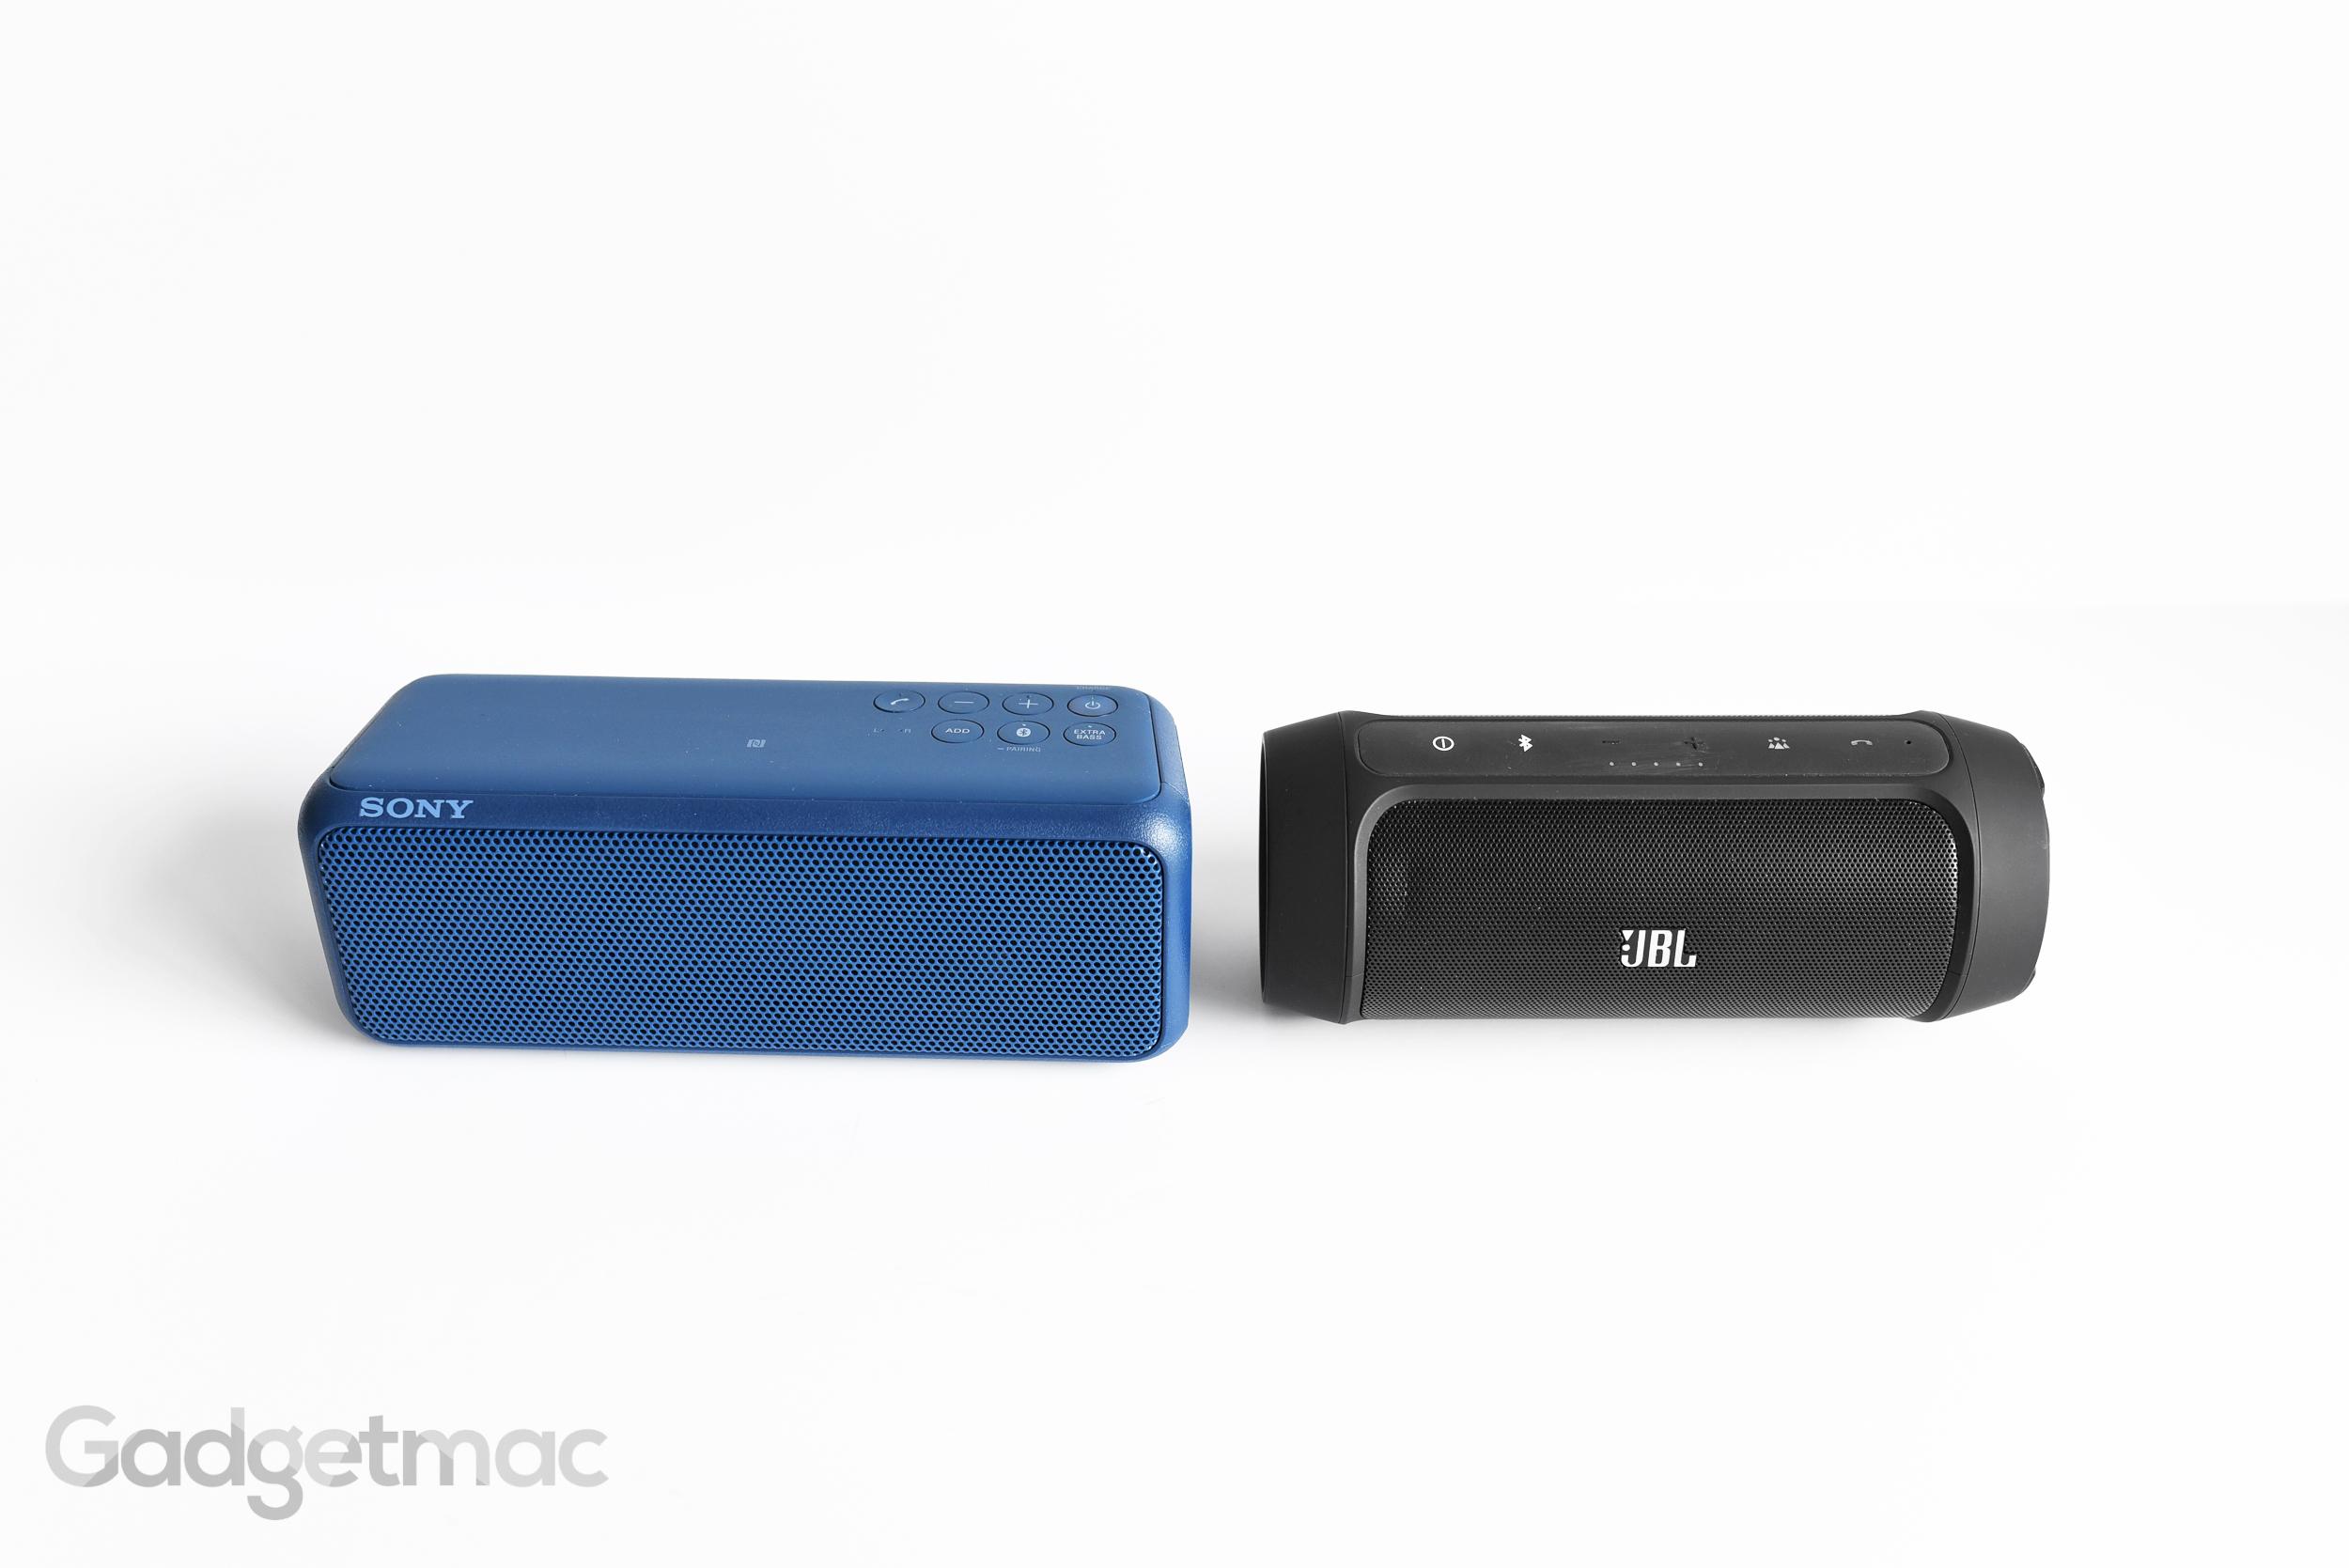 sony-xb3-portable-wireless-speaker-vs-jbl-charge-2.jpg